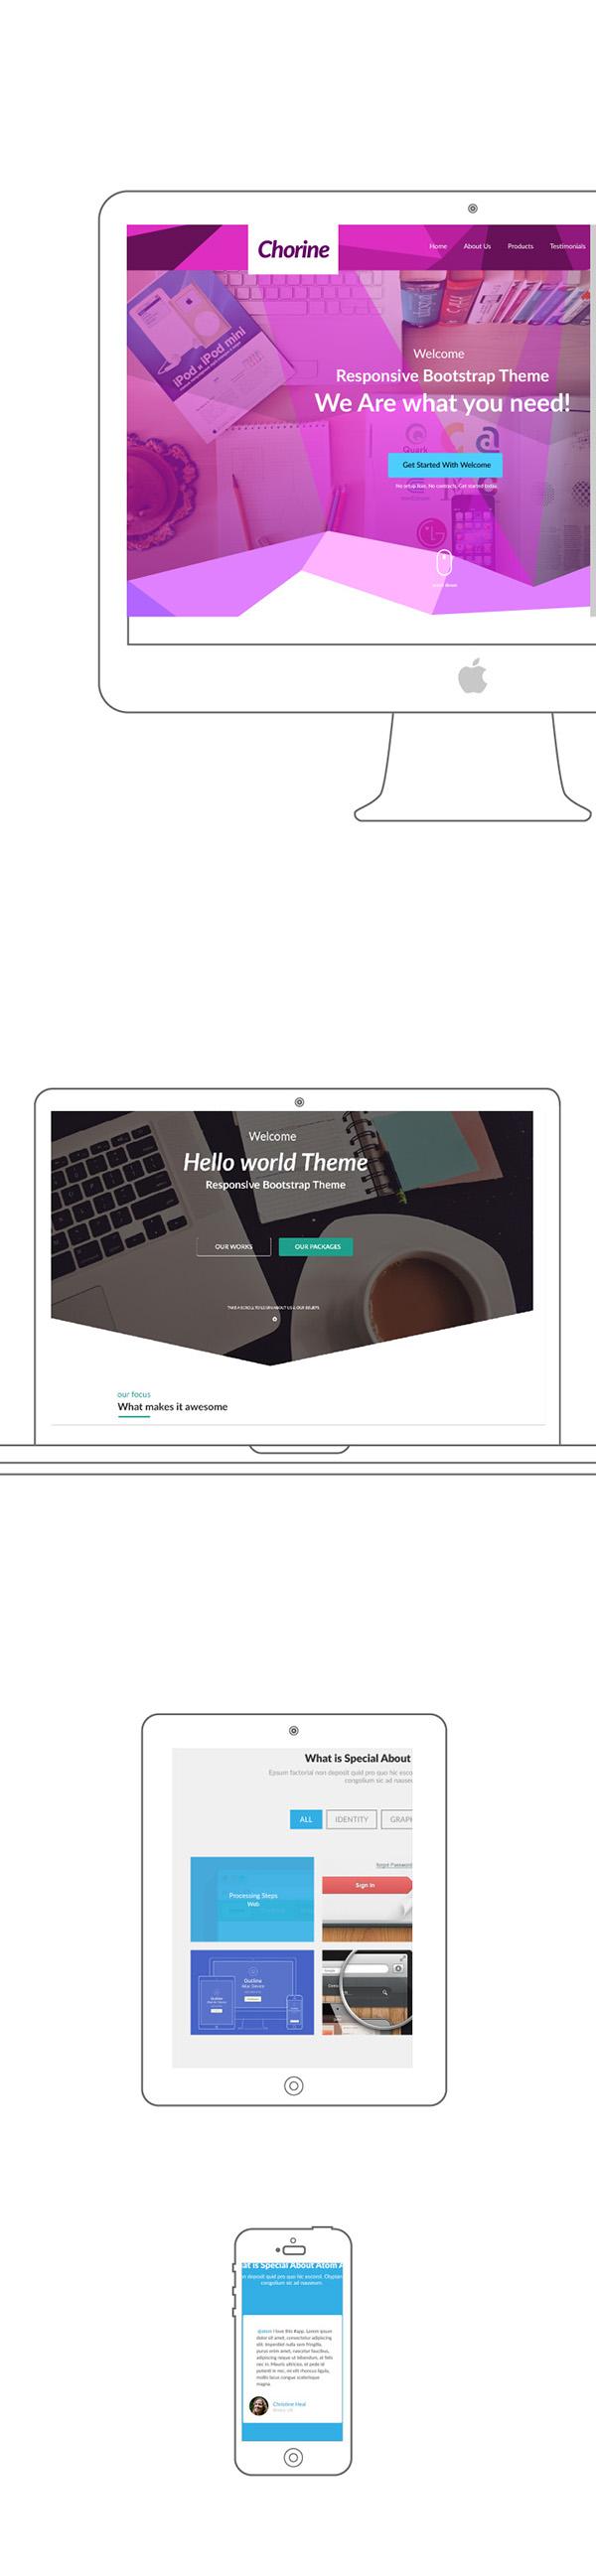 Mockup outline apple device free